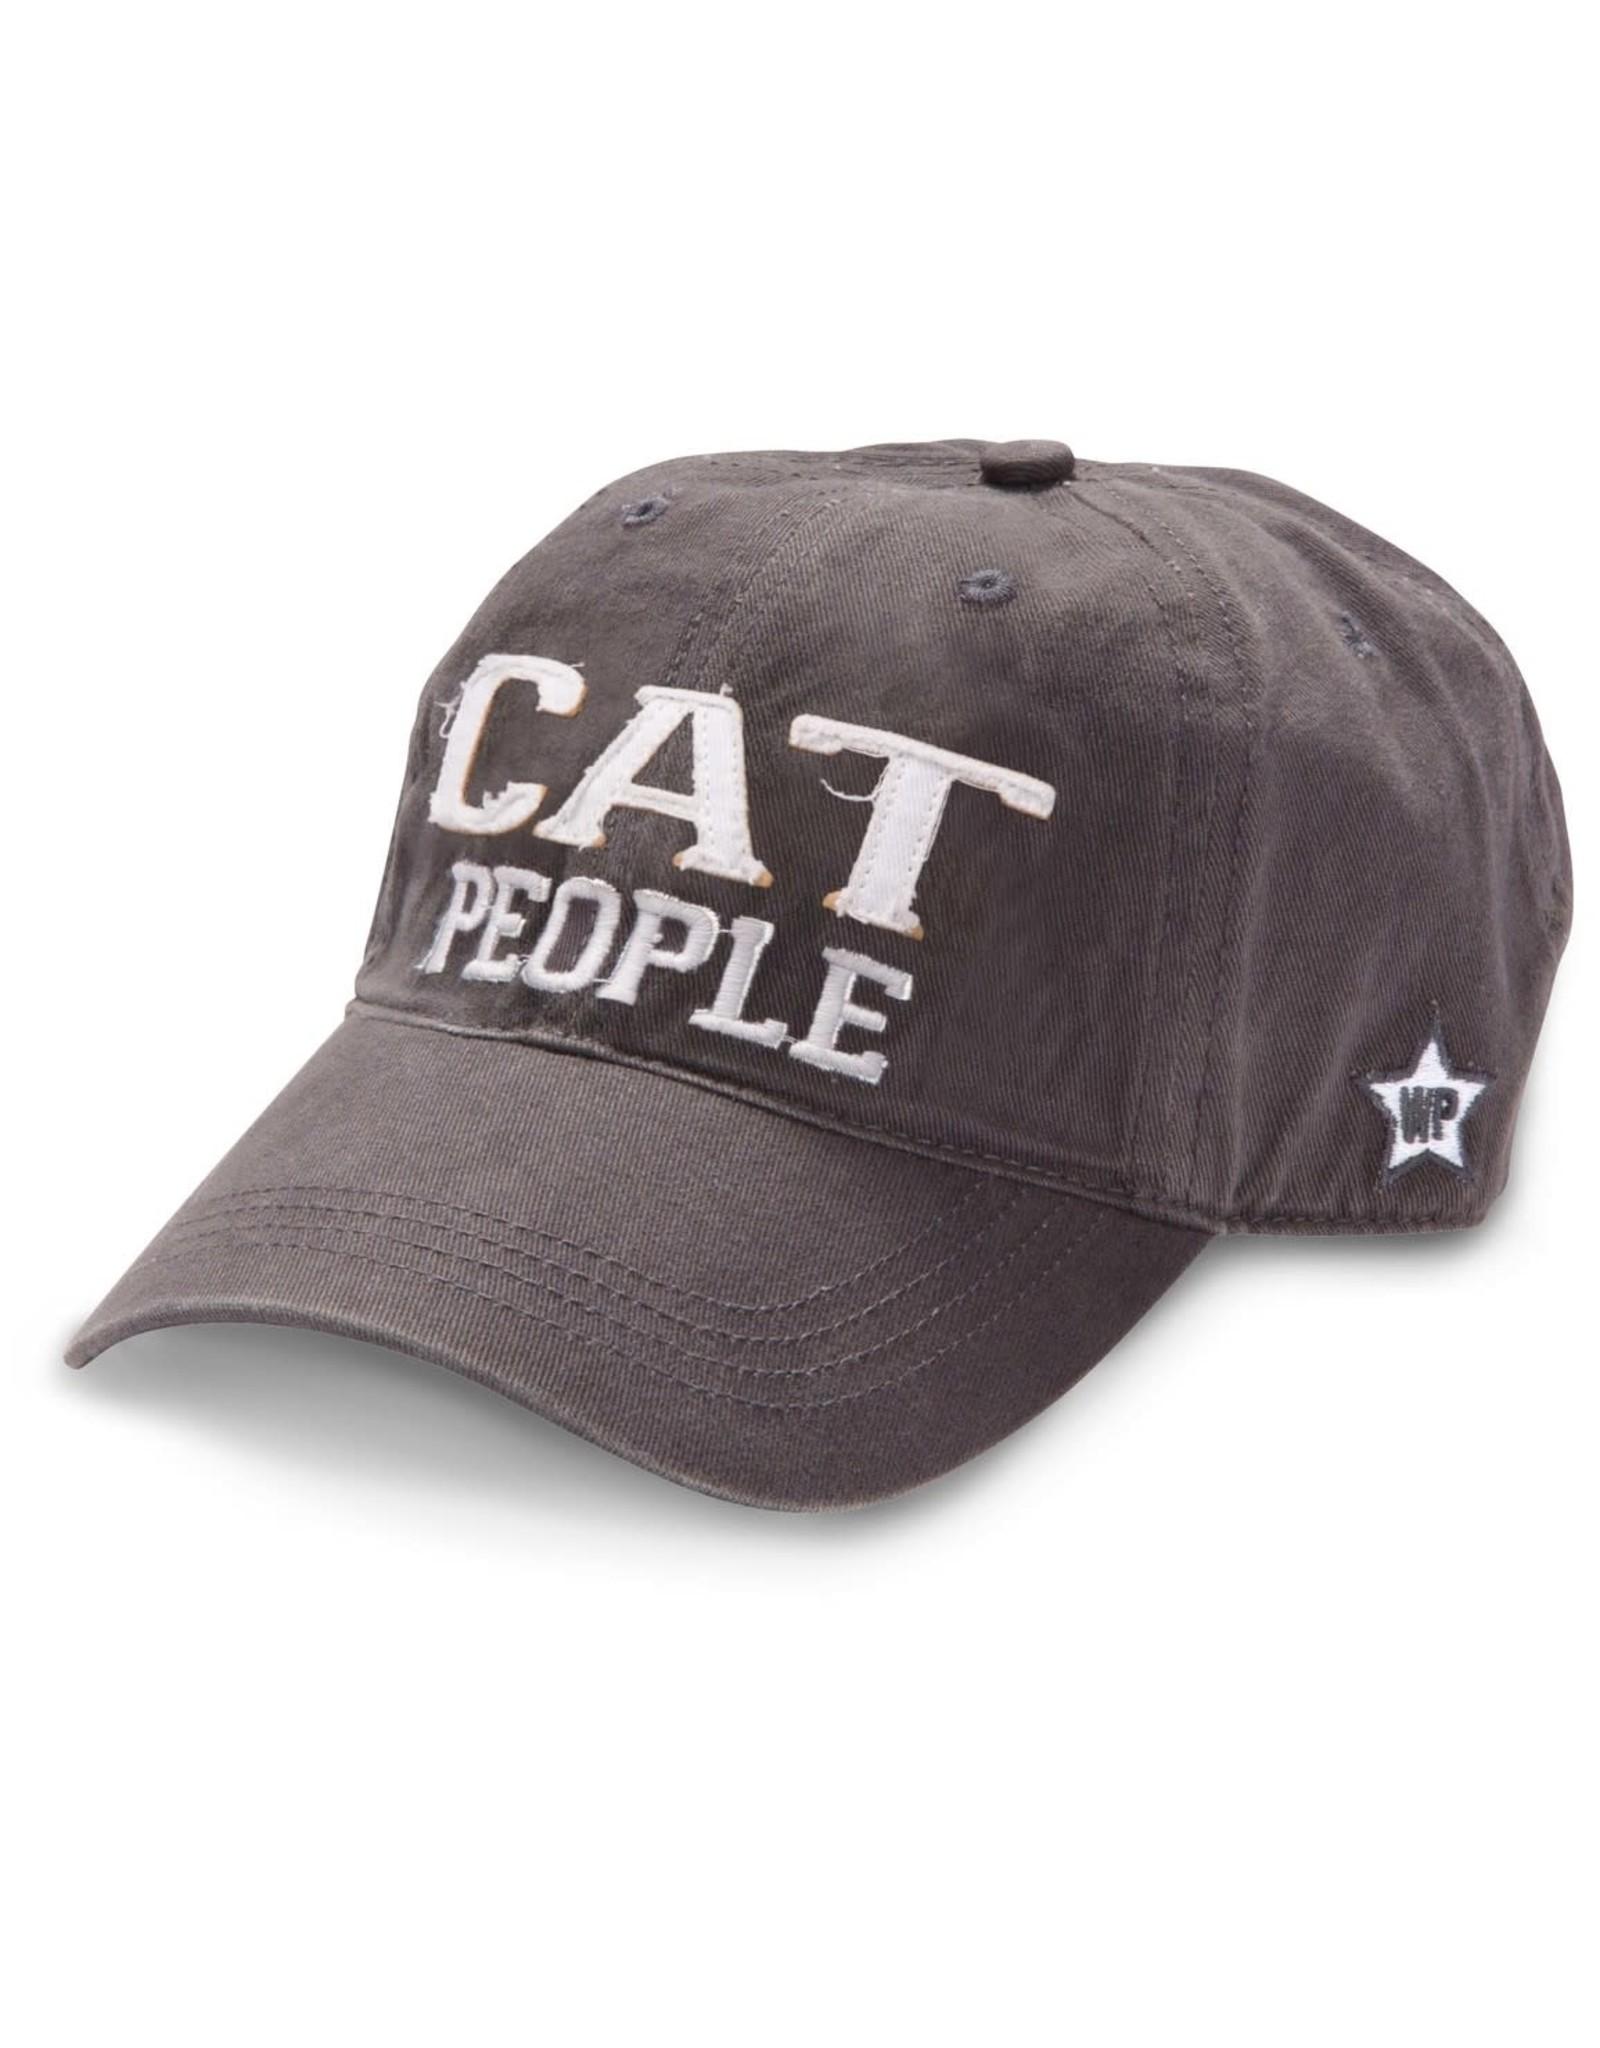 Pavilion Gift CAT PEOPLE HAT